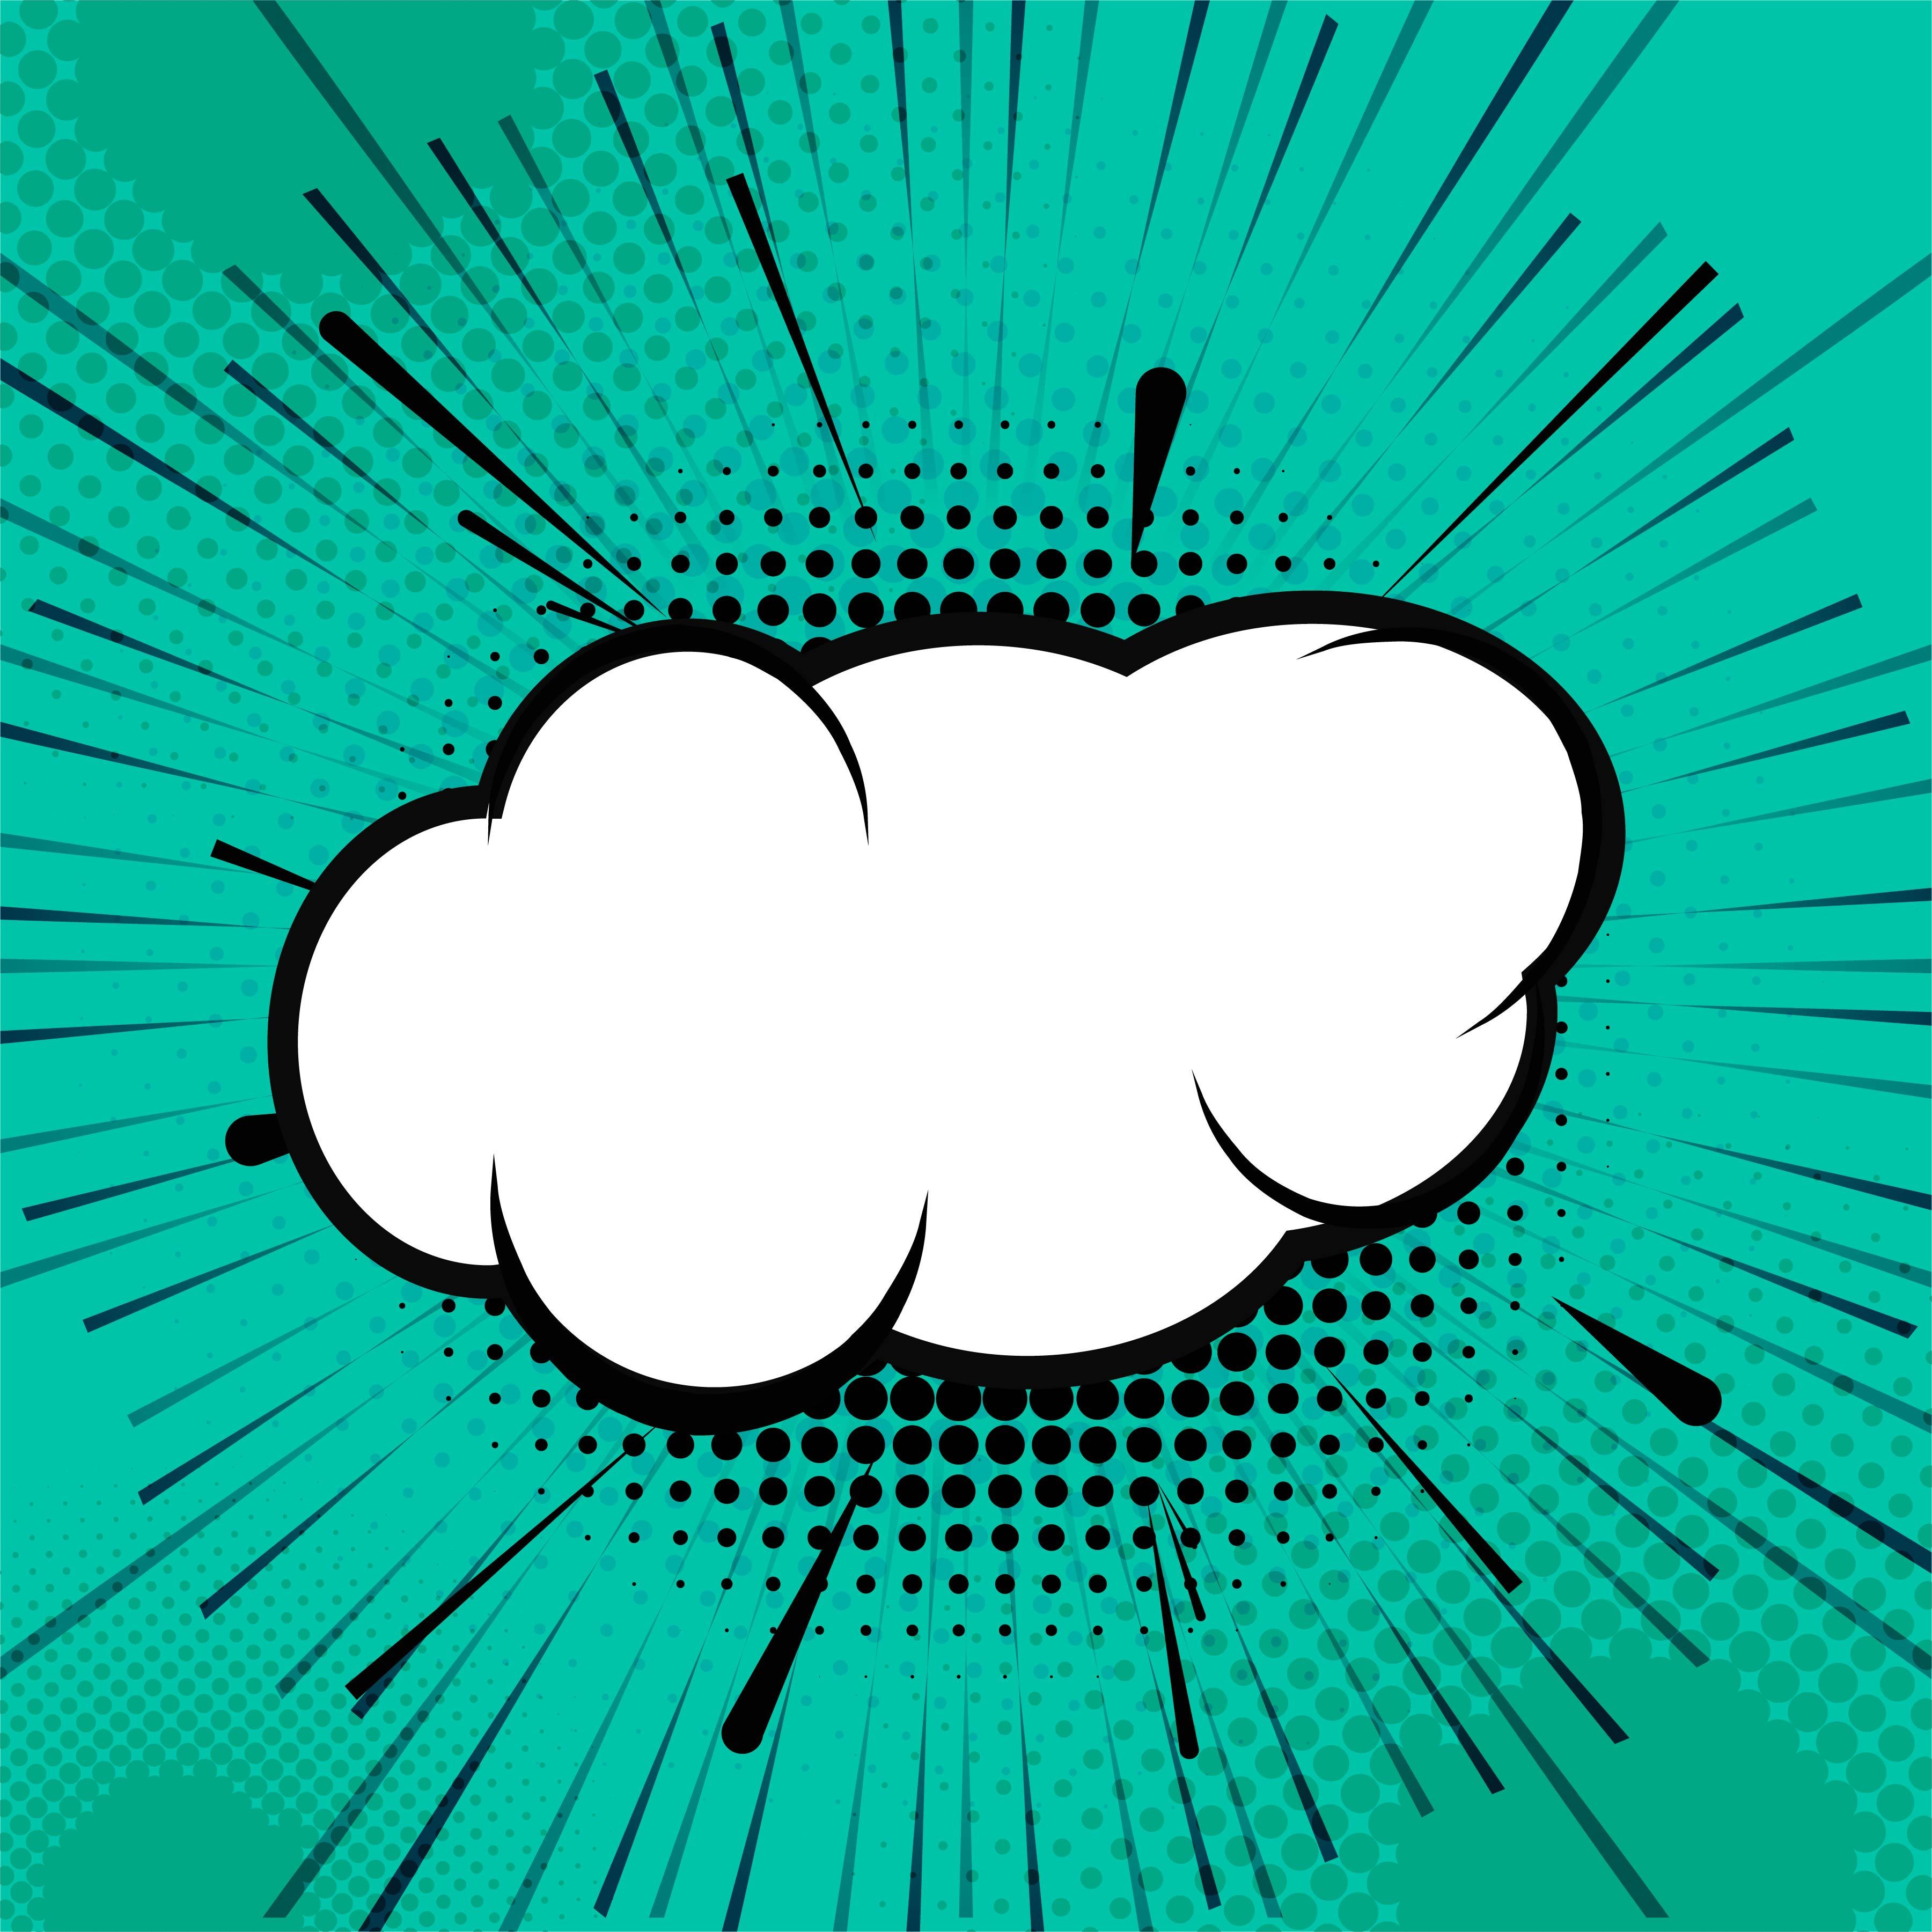 speech bubble pop art comic book background download